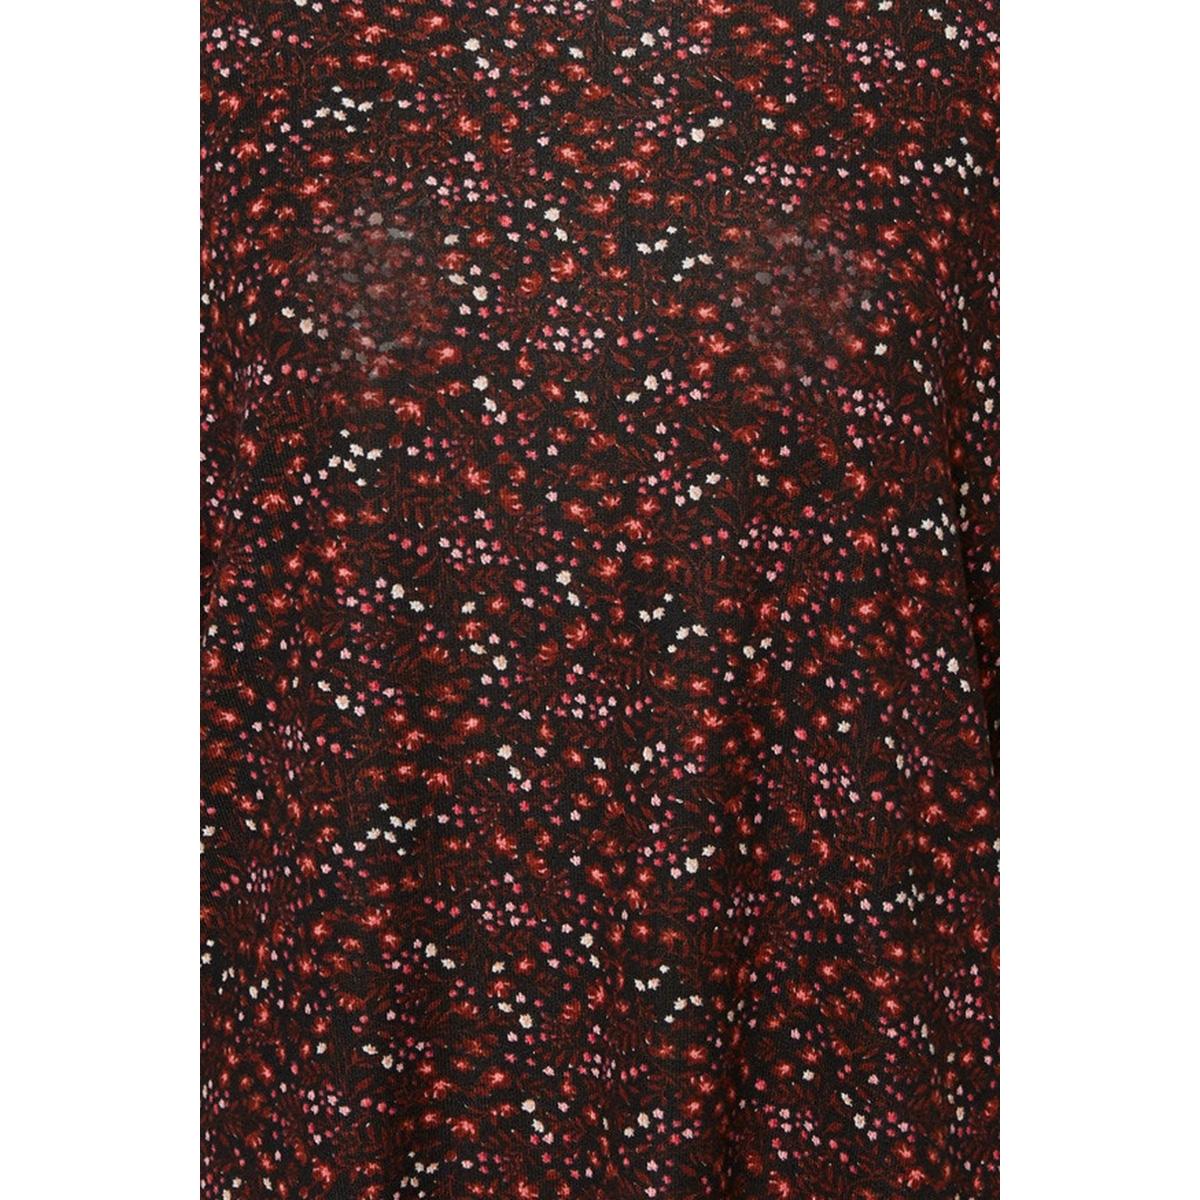 vmmalena 3/4 blouse exp color 10206886 vero moda t-shirt madder brown/lea